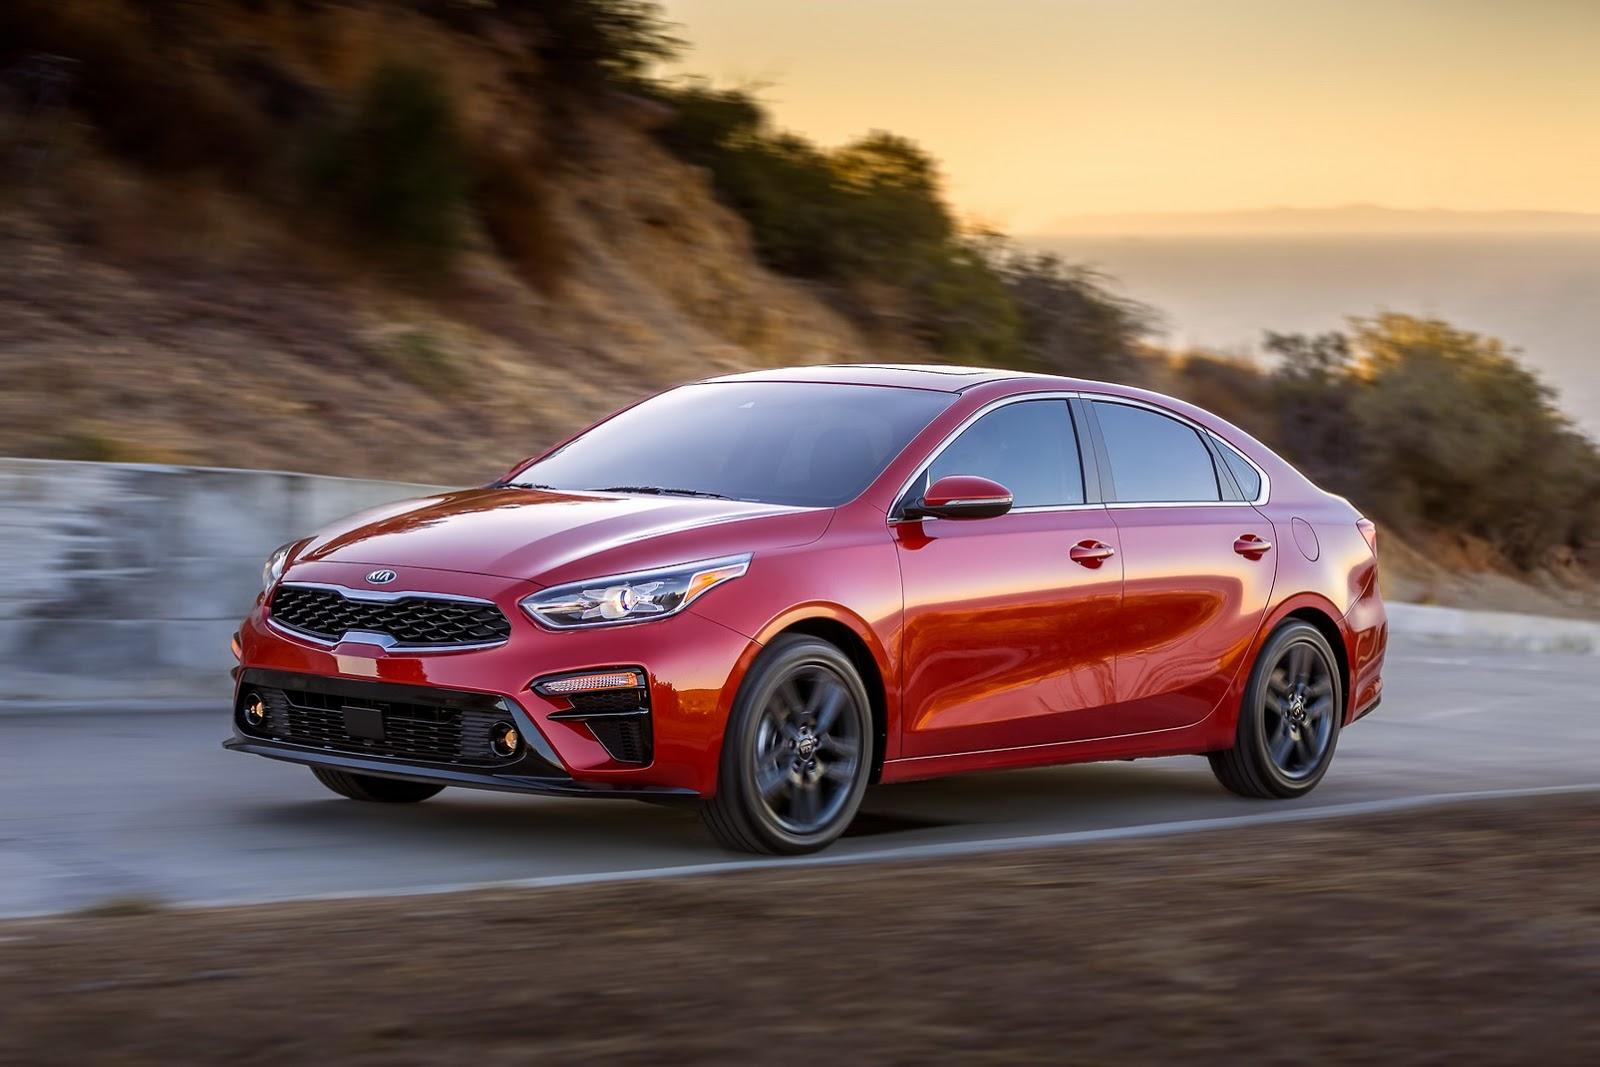 2019 Kia Forte Looks Like an Affordable Stinger ...